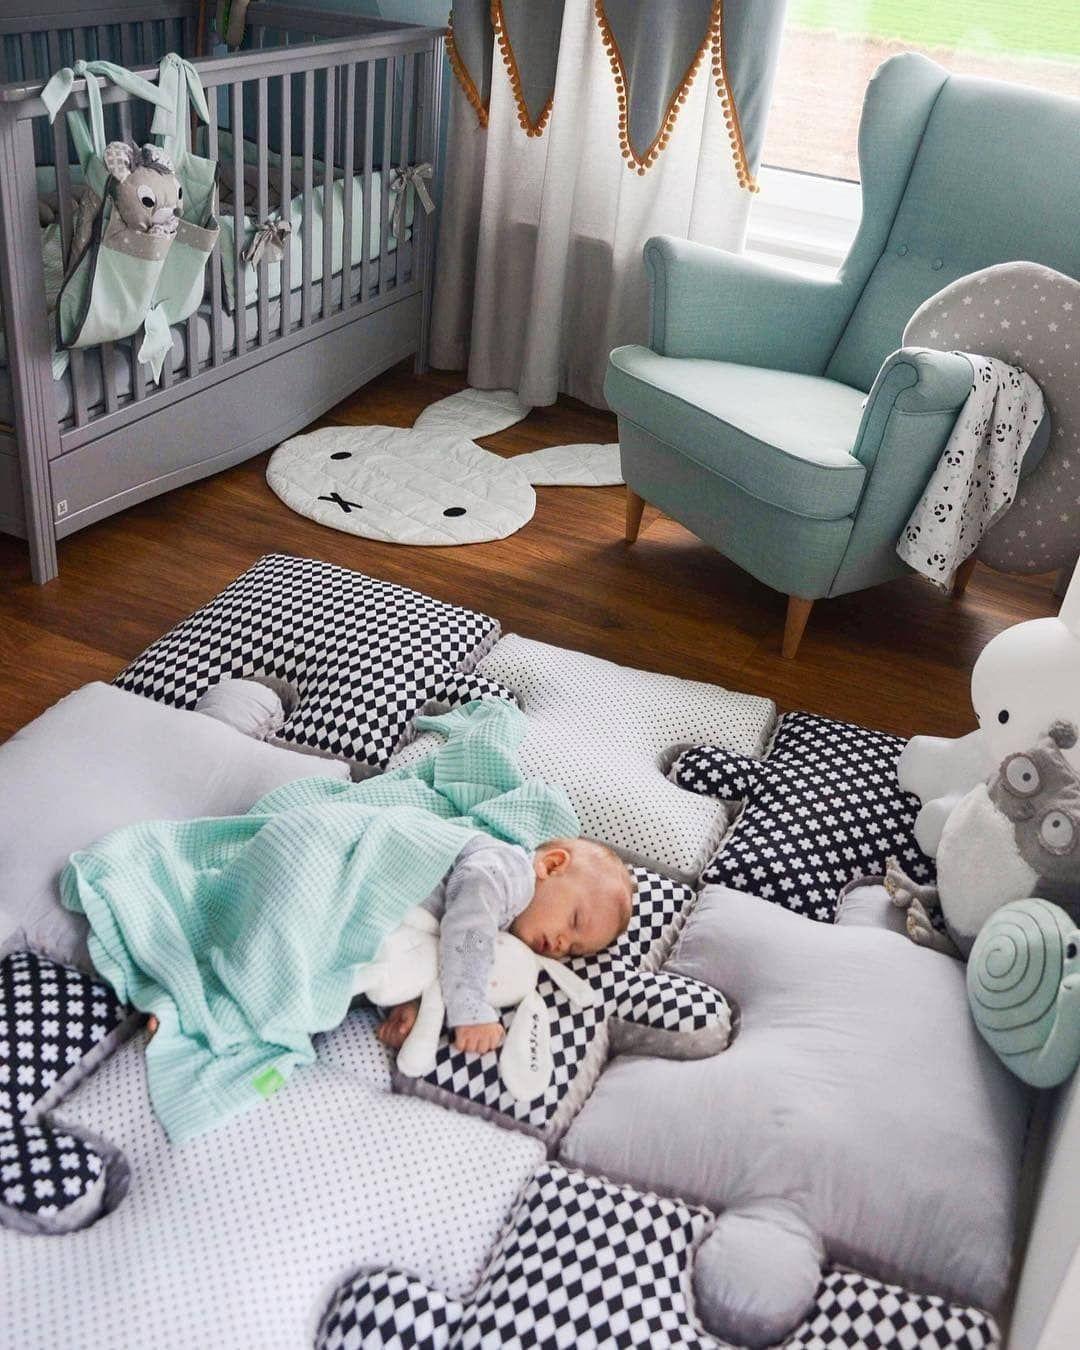 Follow Baby Room Decor Kid Room Decor Baby Room Design